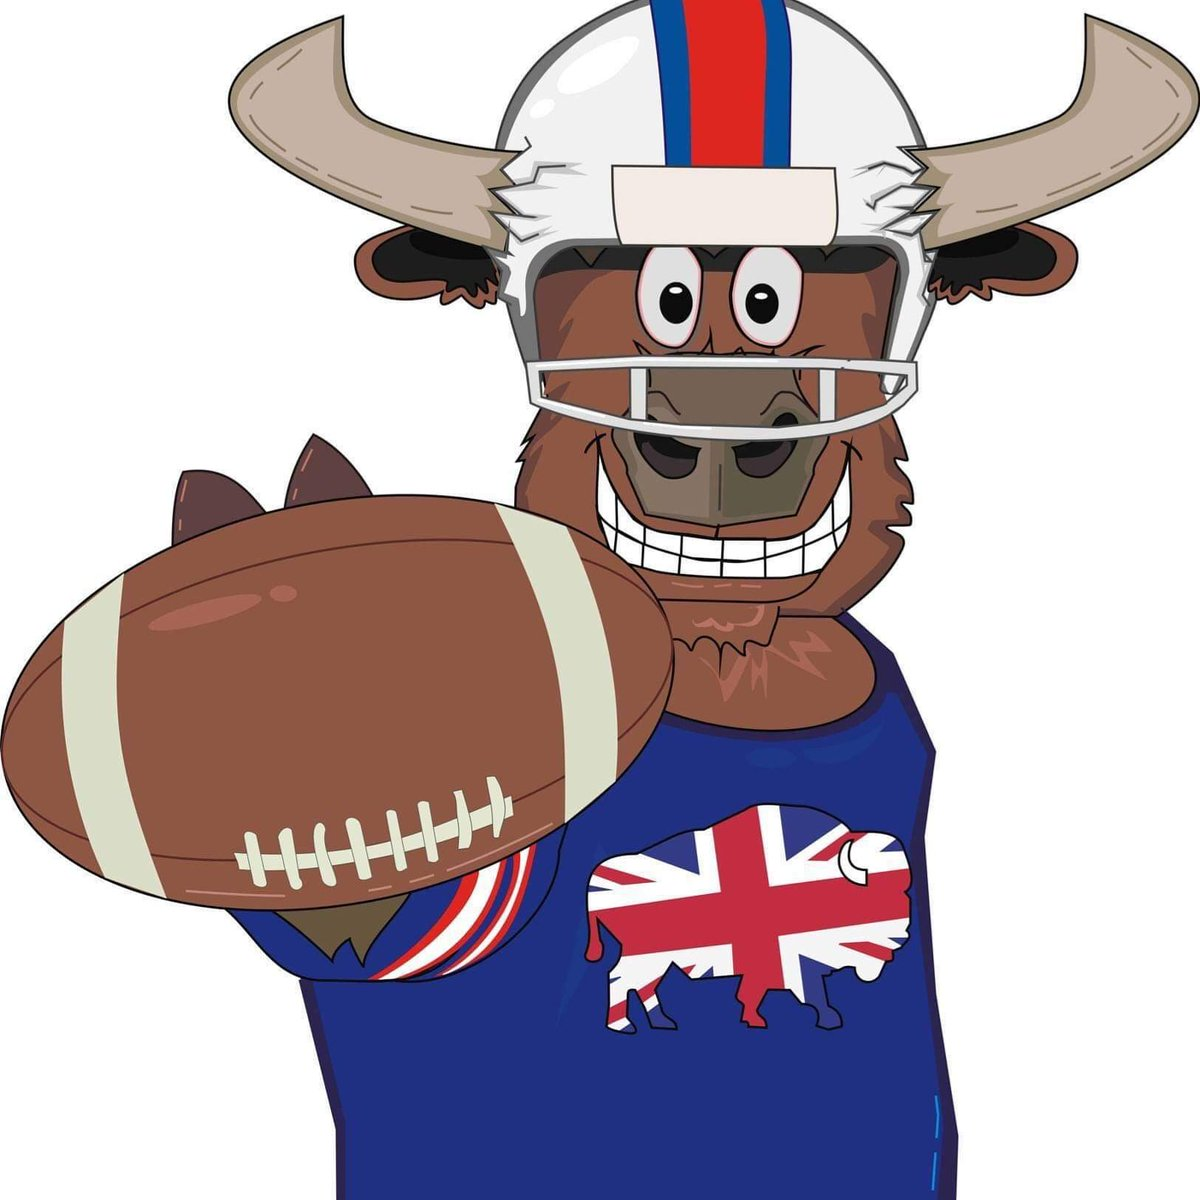 Gentleman, Ladies and Kids alike, we would like to introduce the newest UK Bills addition, Ralph the Buffalo. #BillsMafia #UKBills #GoBills